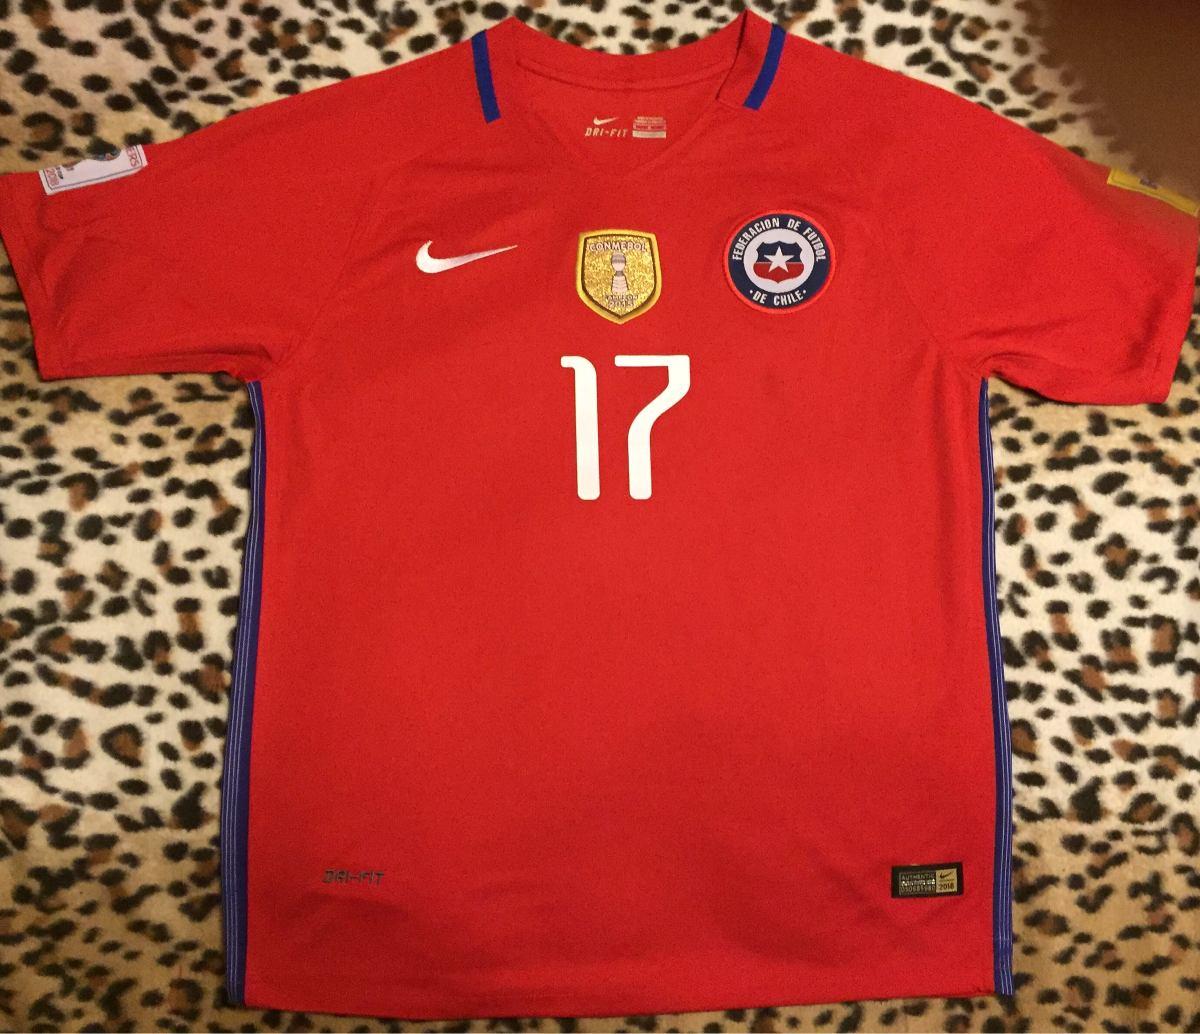 Chilena 990 Niño Gratis Camiseta Envio Seleccion 201816 Adulto 7gbf6vYy